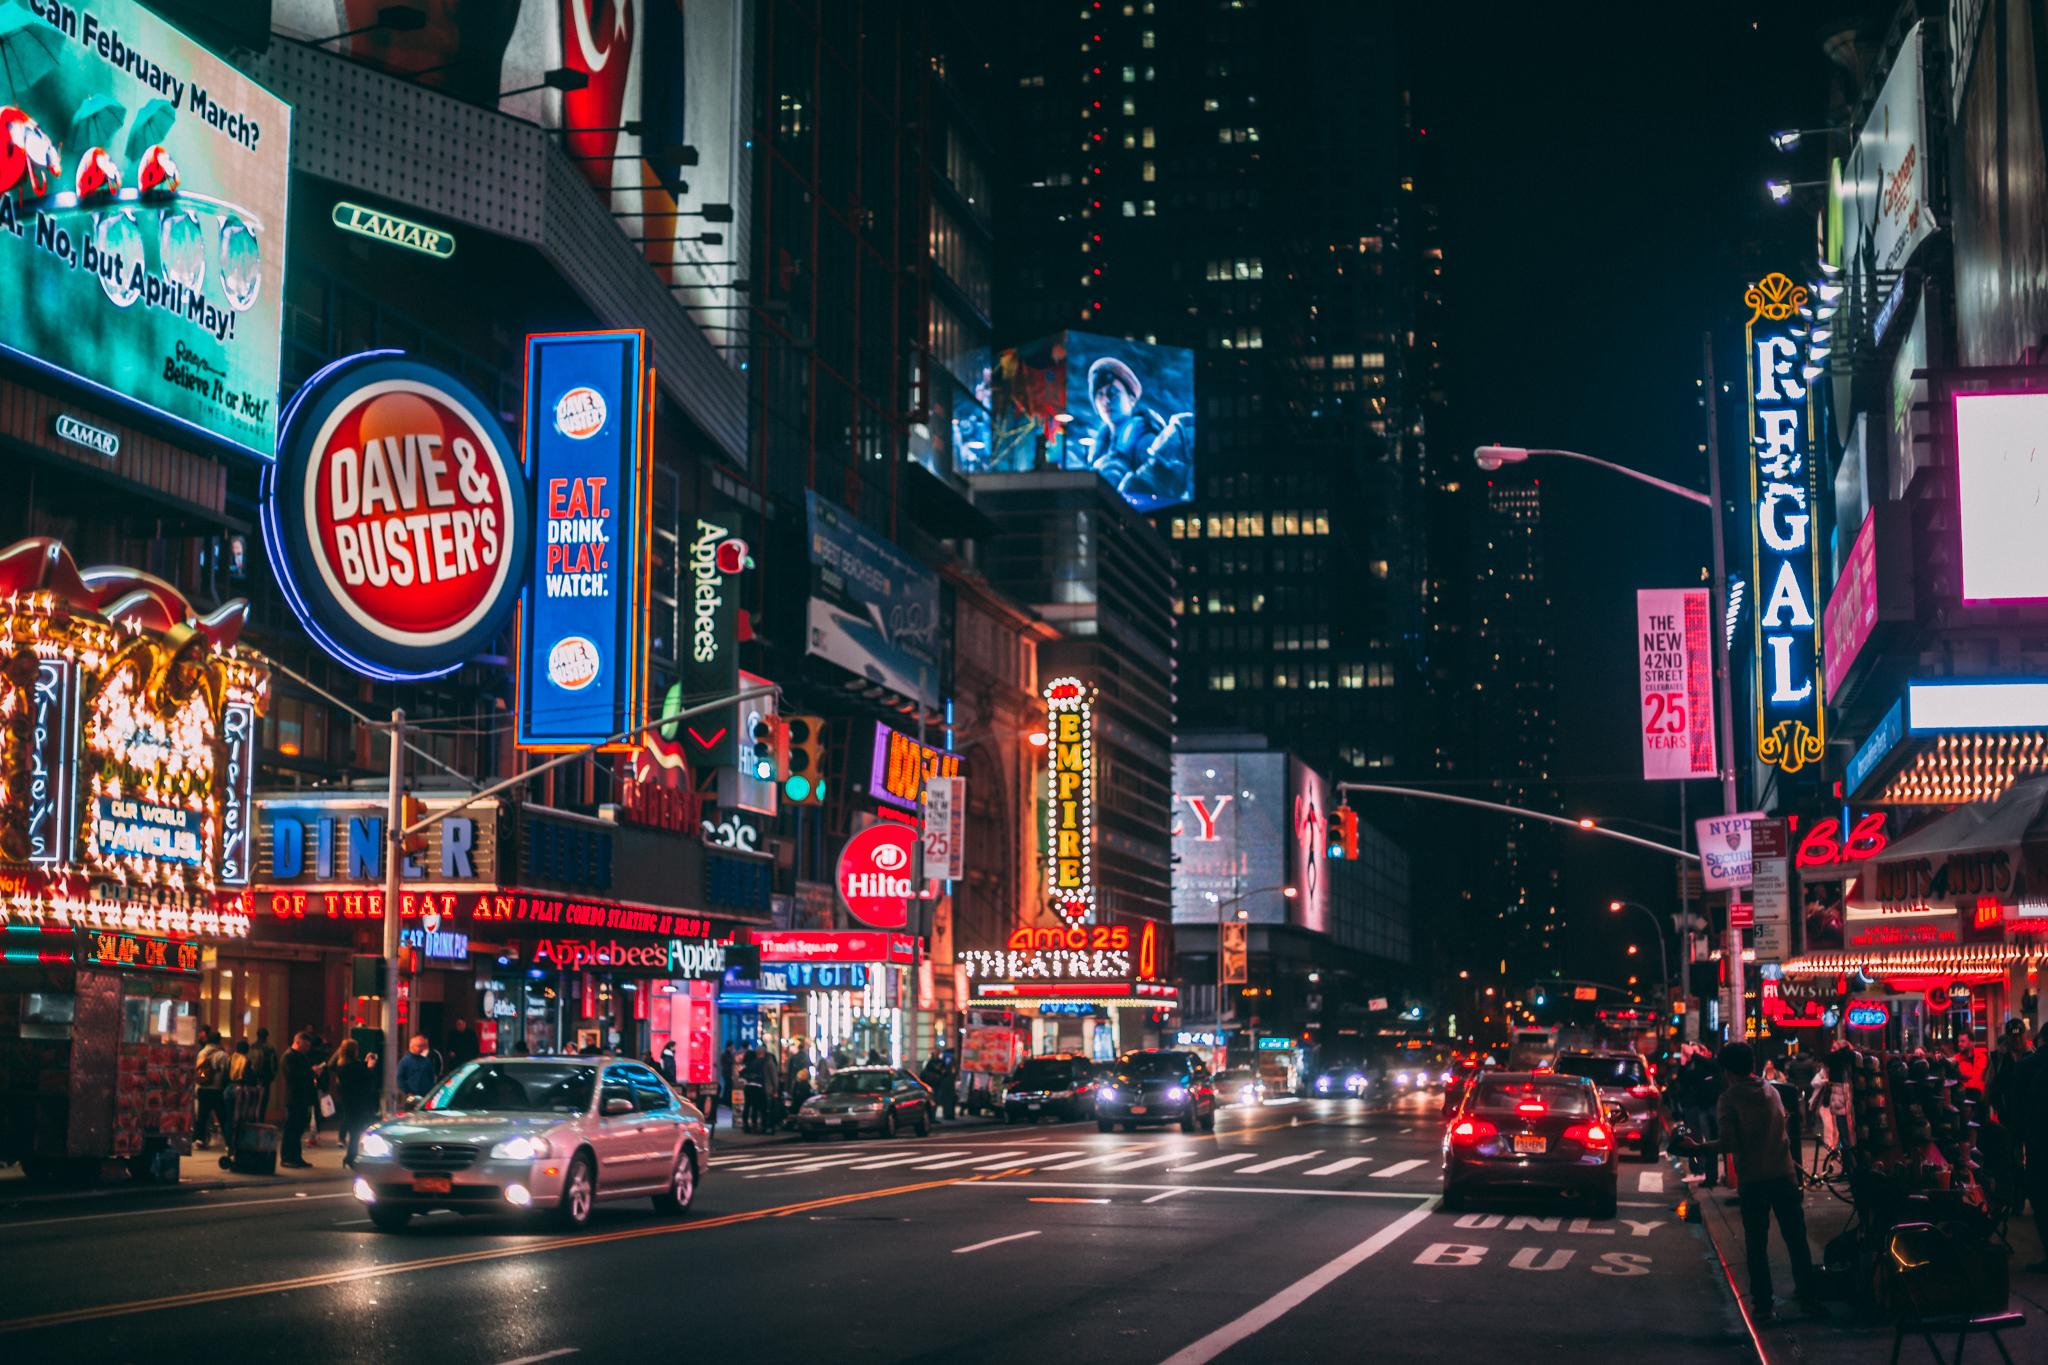 New York City, May 2016